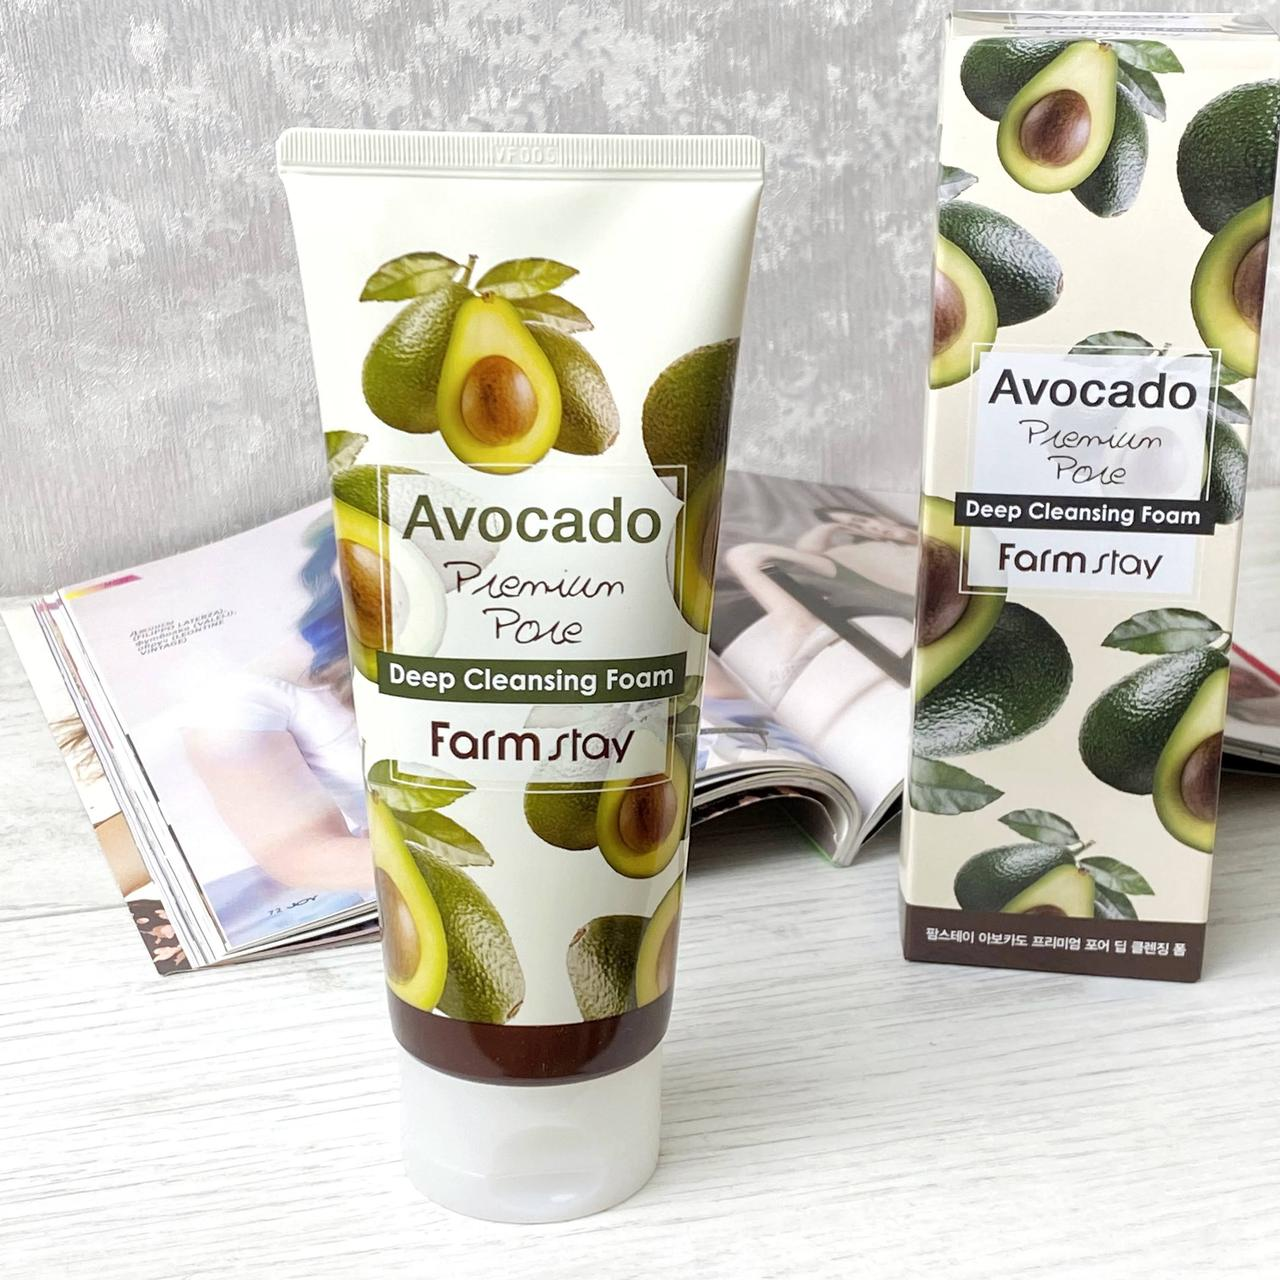 Пенка для умывания FarmStay Avocado Premium Pore Deep Cleansing Foam